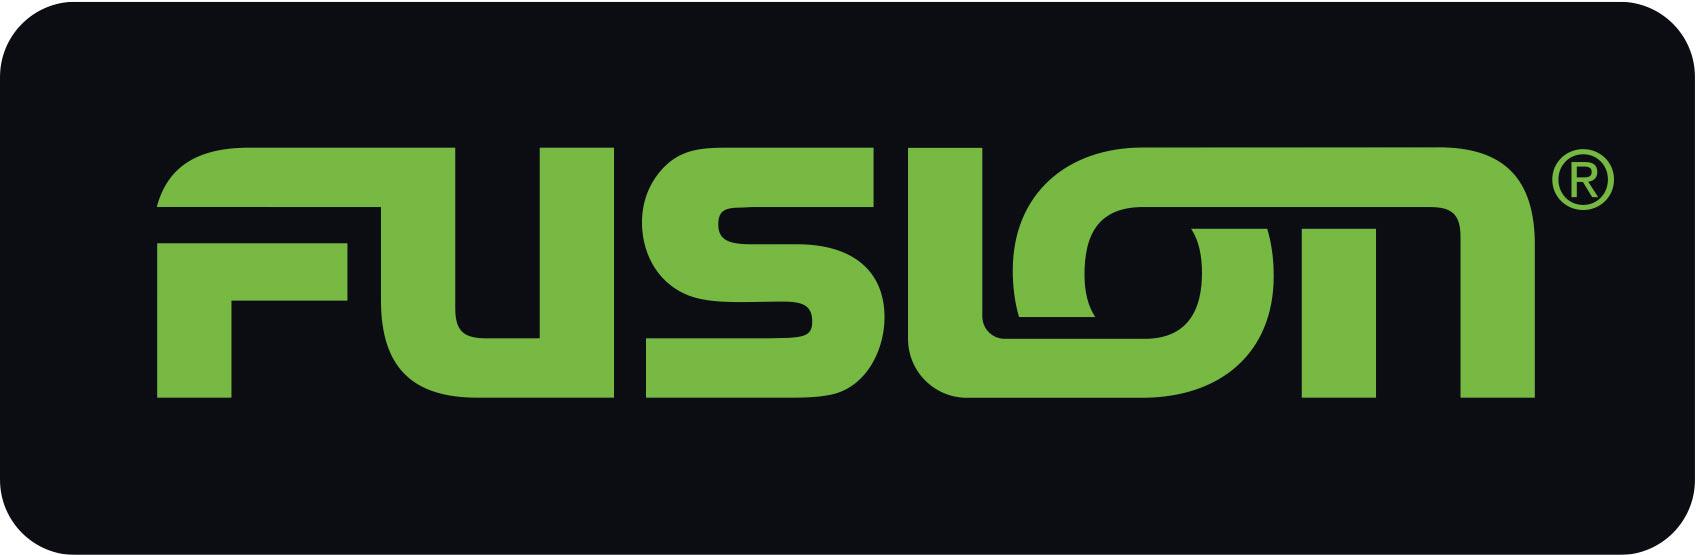 Fusion_logo_m